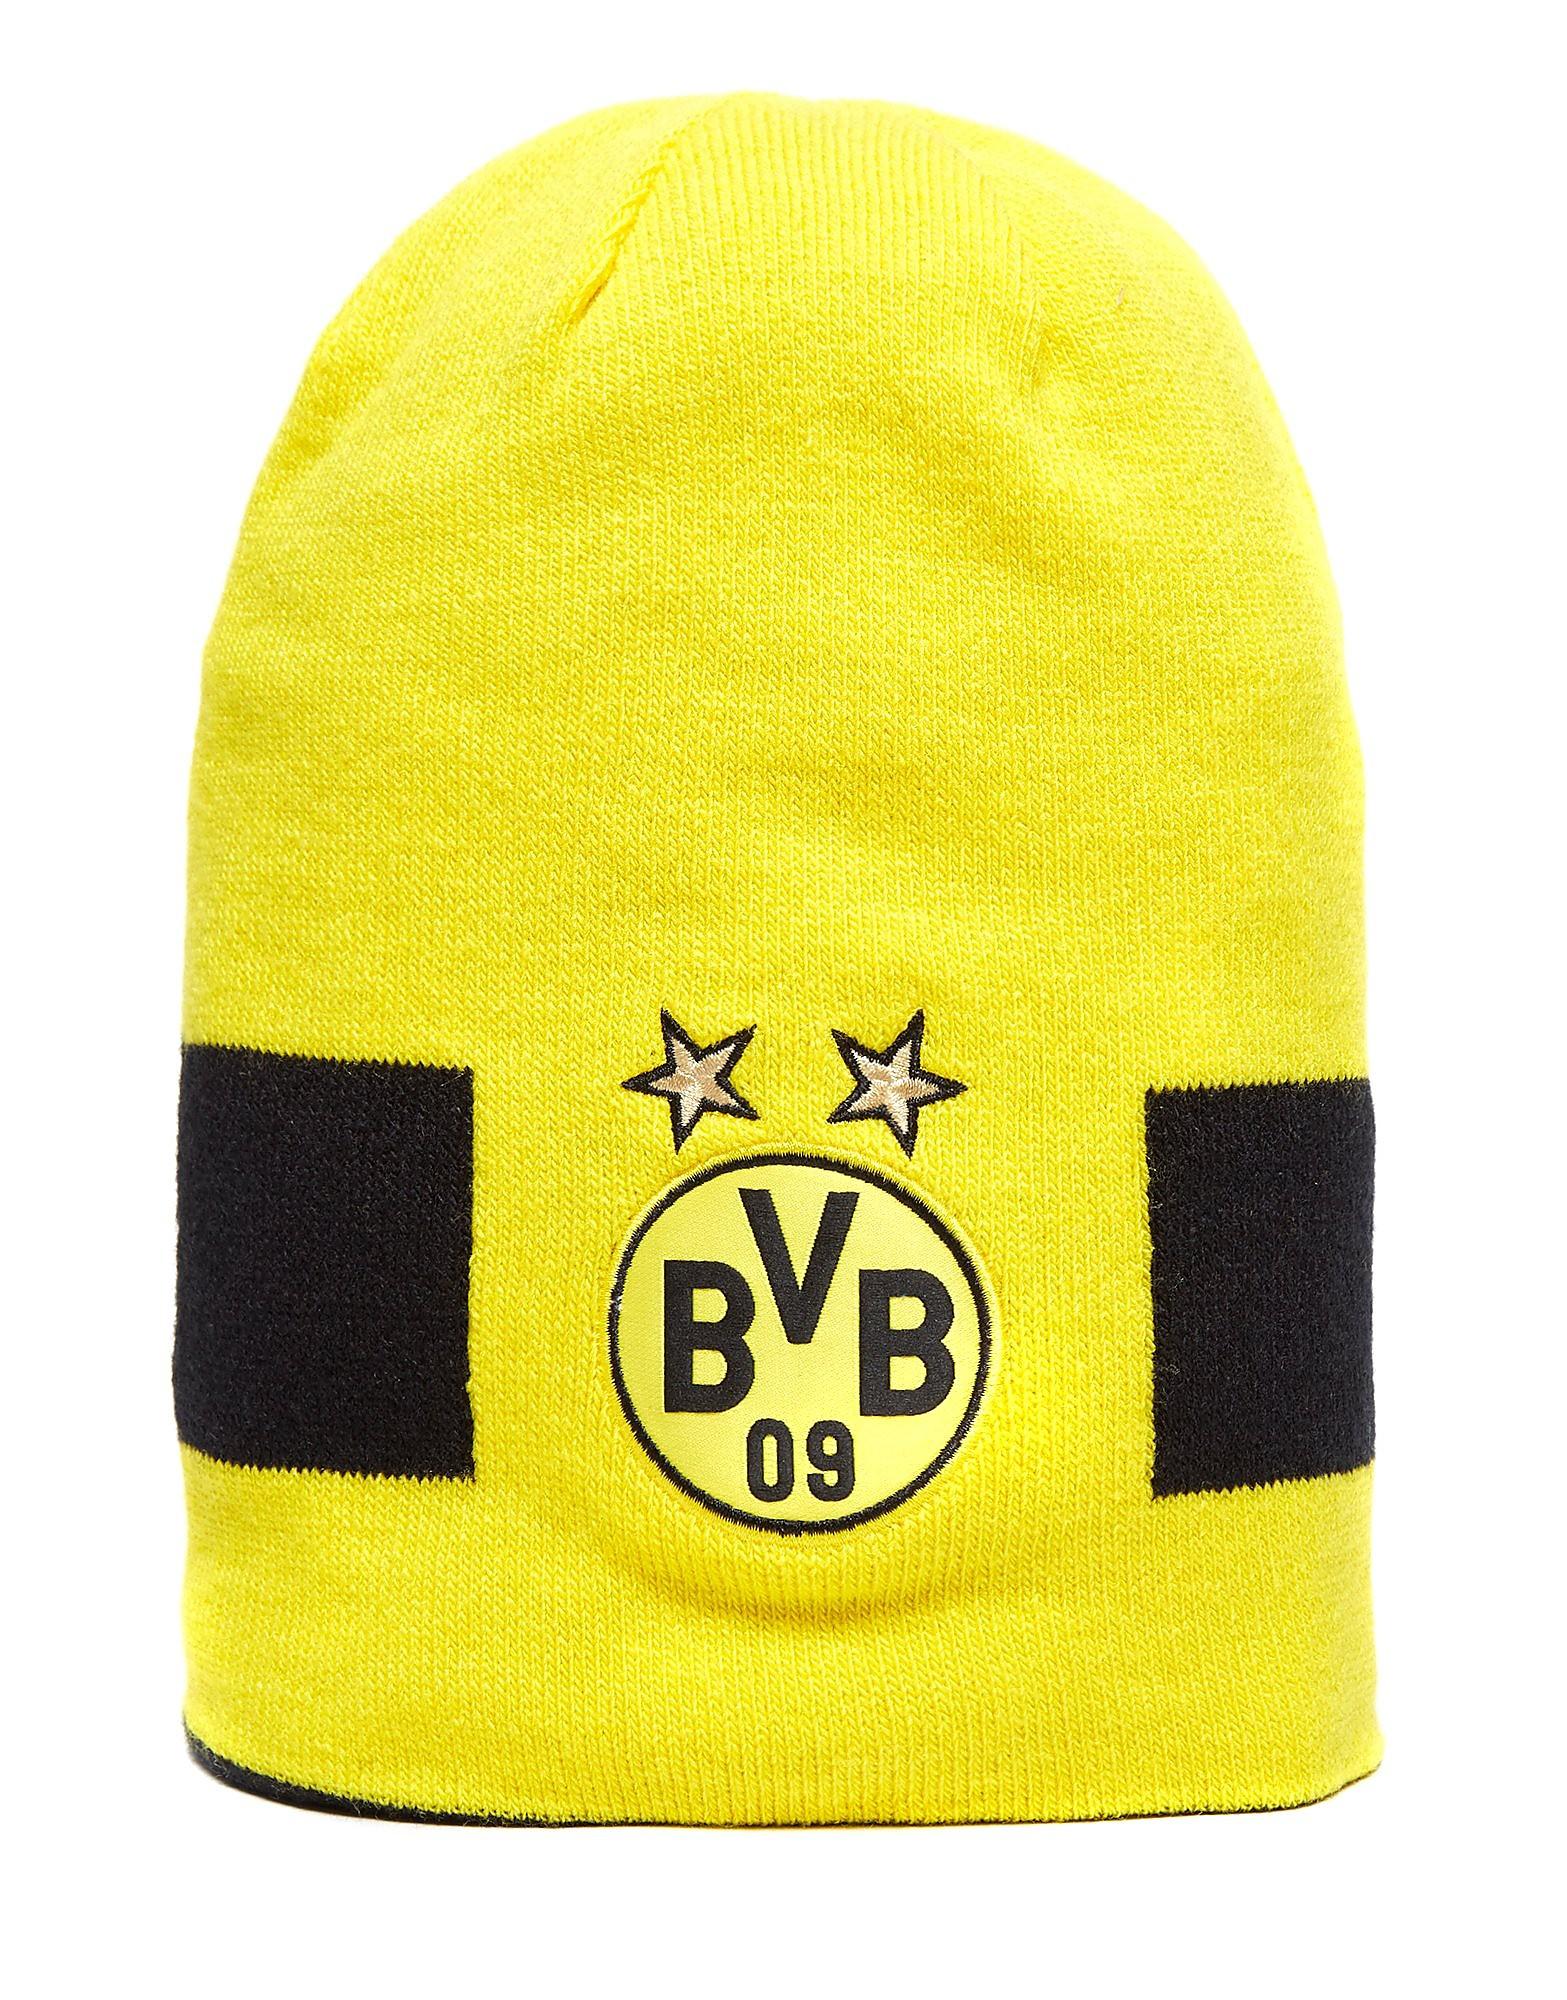 PUMA Borussia Dortmund Performance Beanie Hat